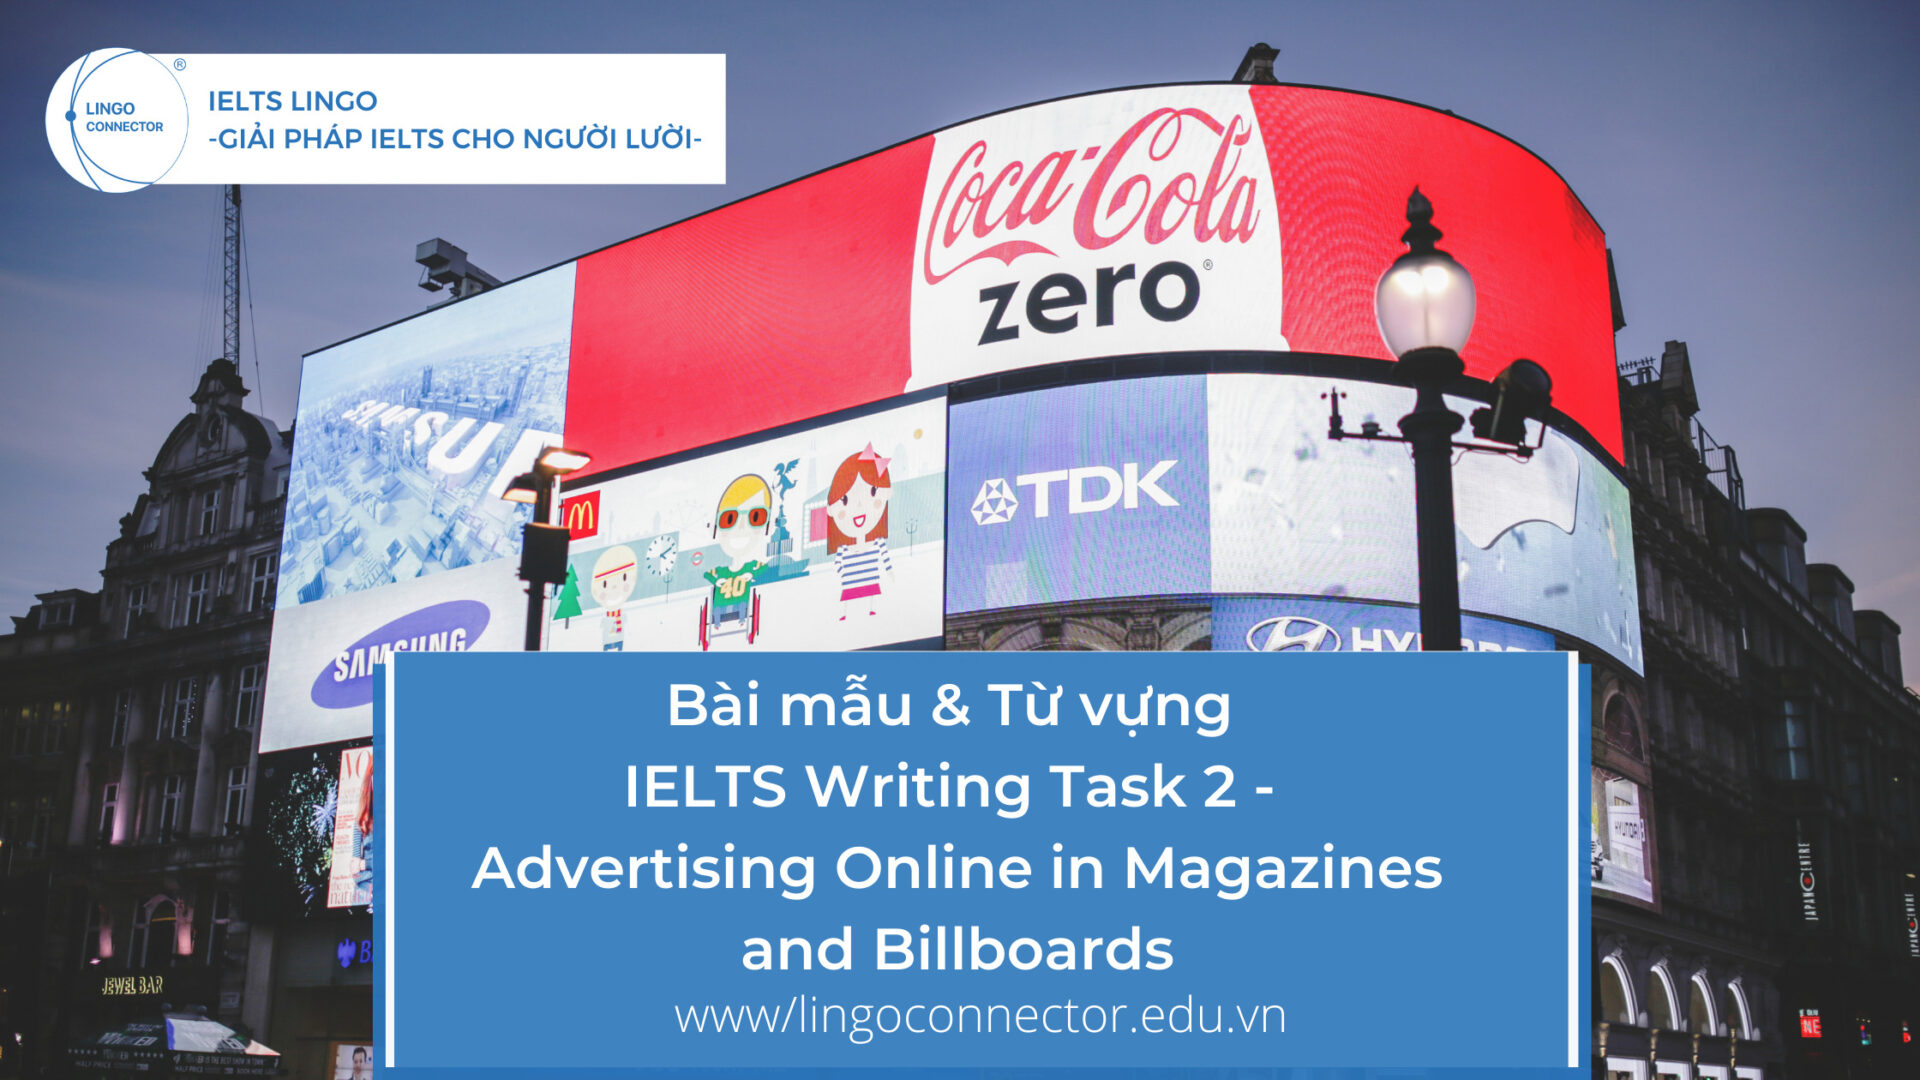 Bài mẫu & Từ vựng IELTS Writing Task 2 - Companies Spend Millions Each Year on Advertising Online in Magazines and Billboards